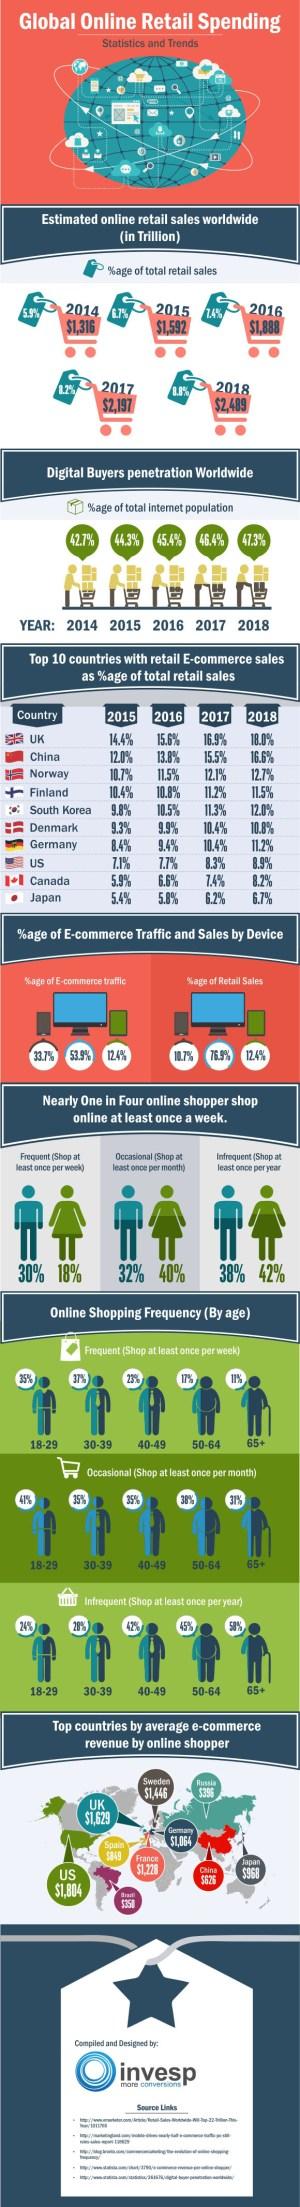 Online Spending Statistics